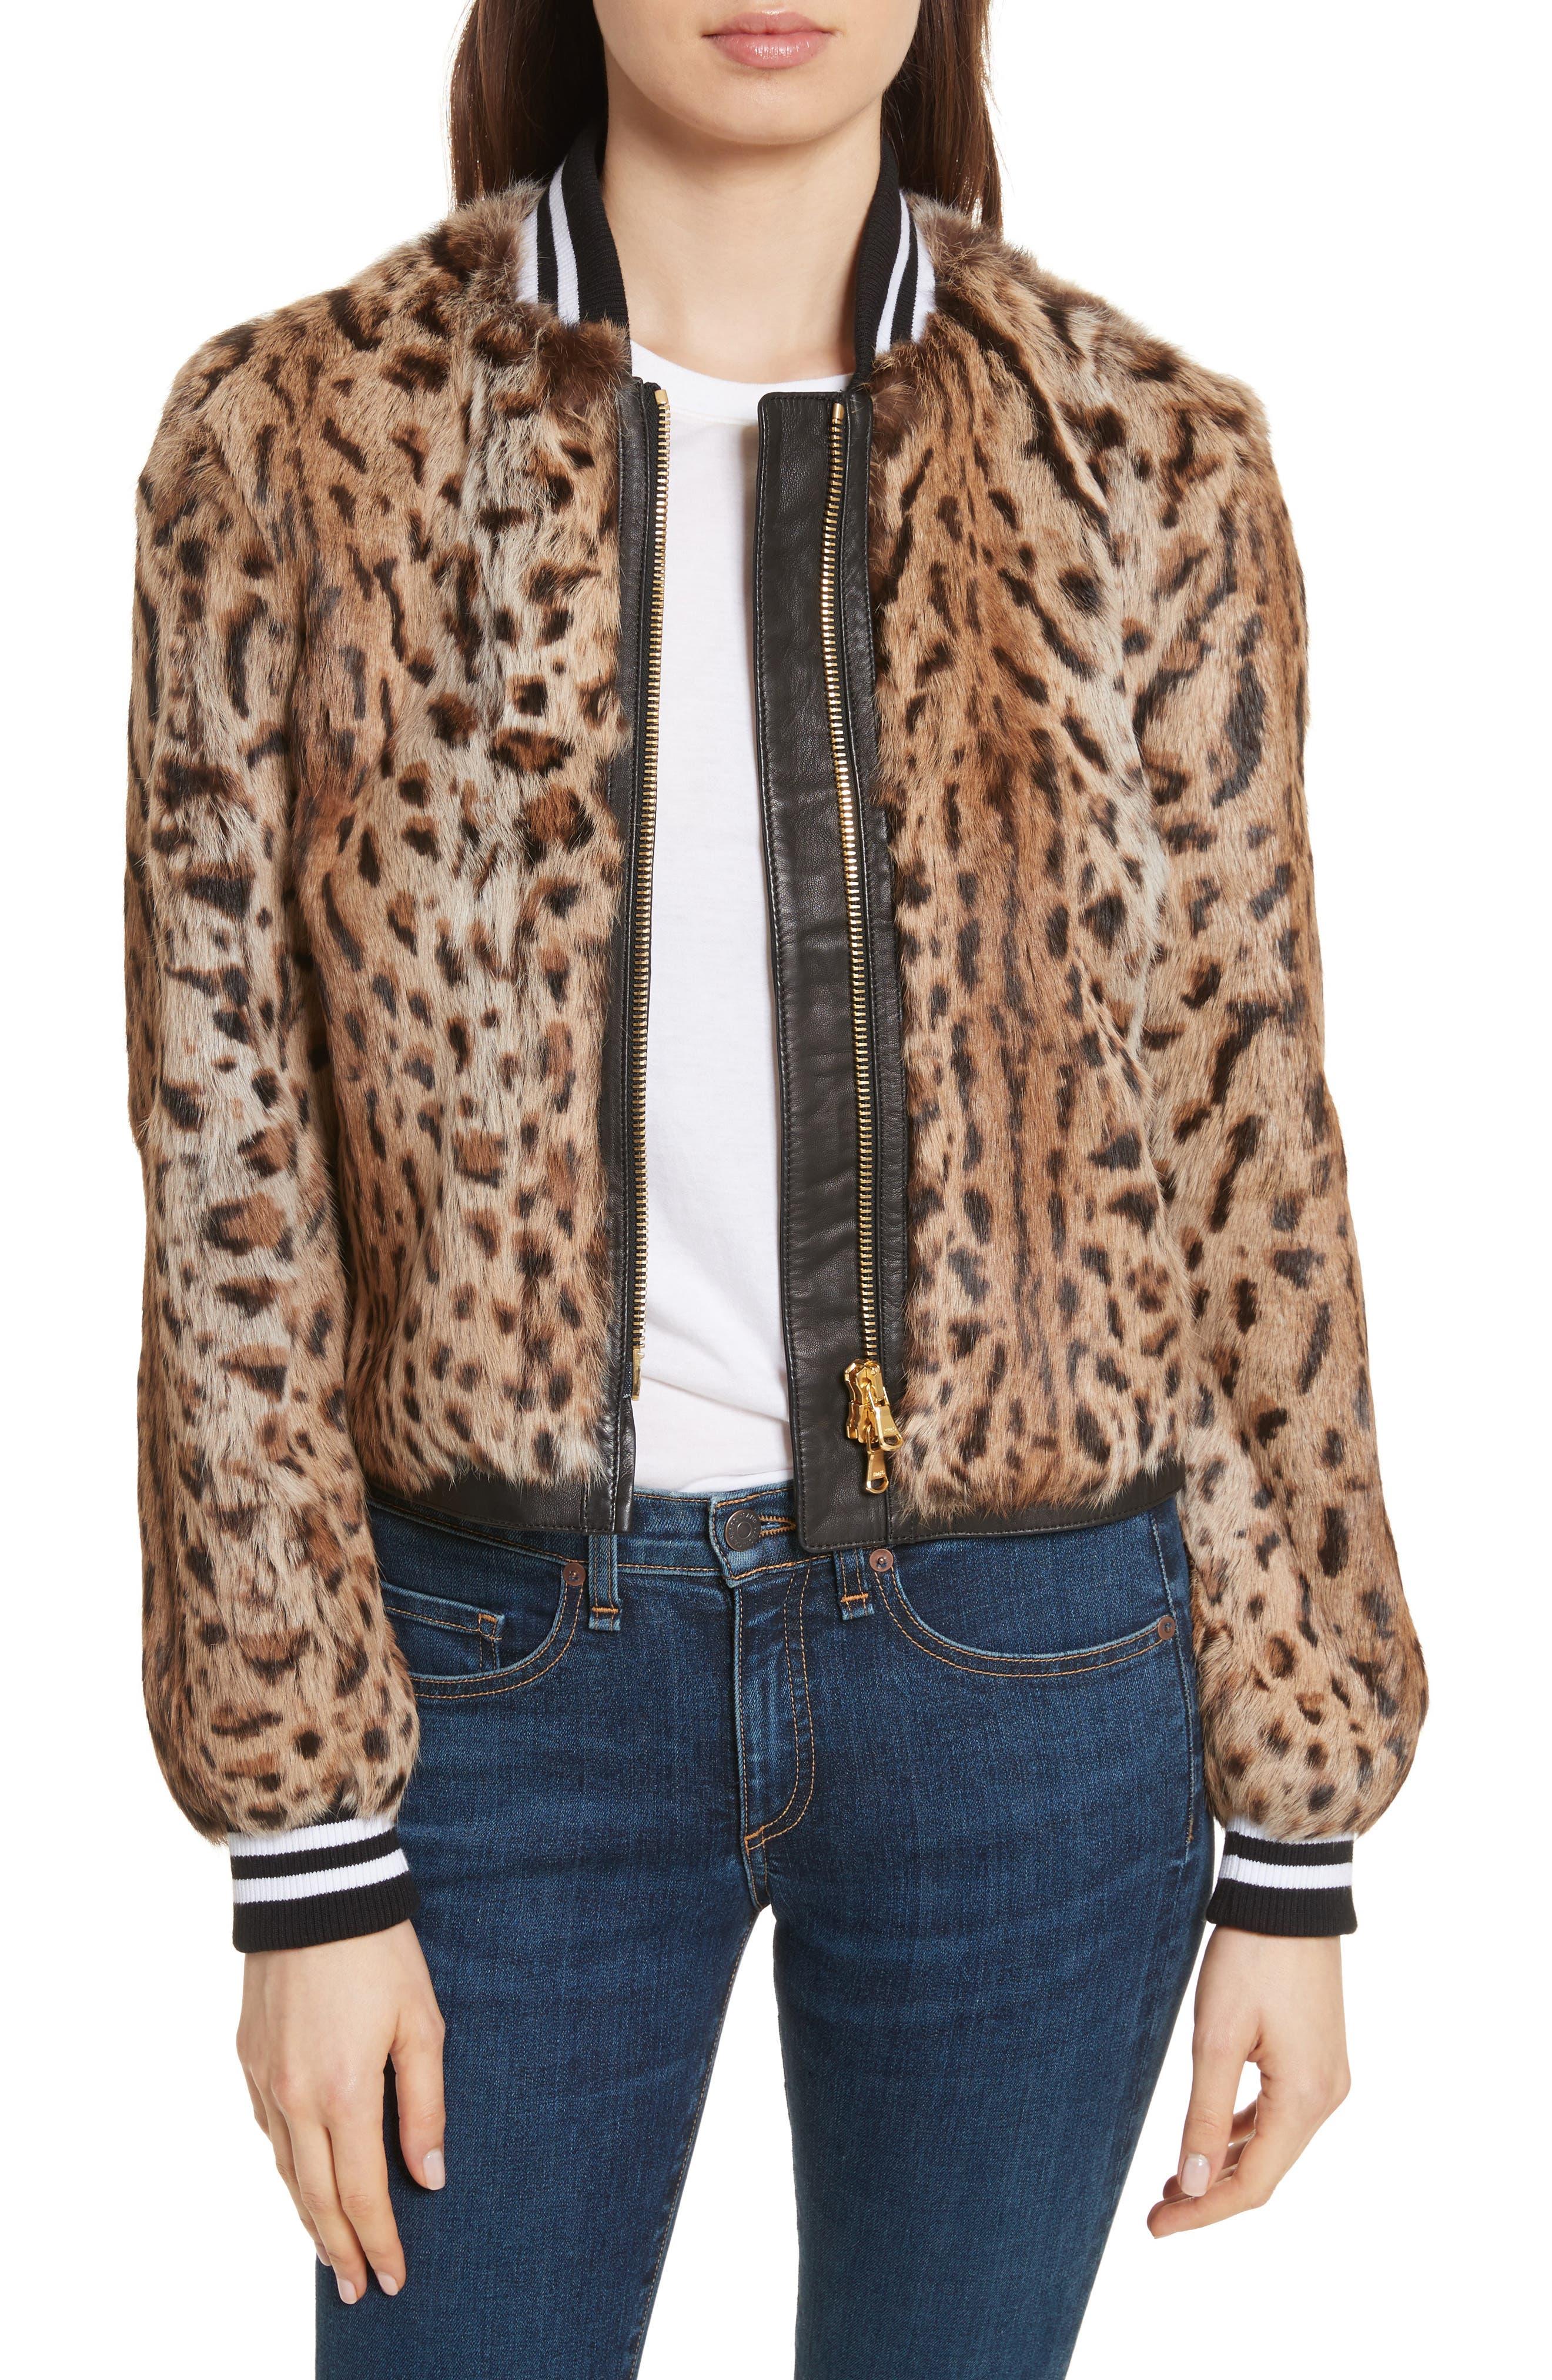 Veronica Beard Etta Genuine Rabbit Fur Jacket